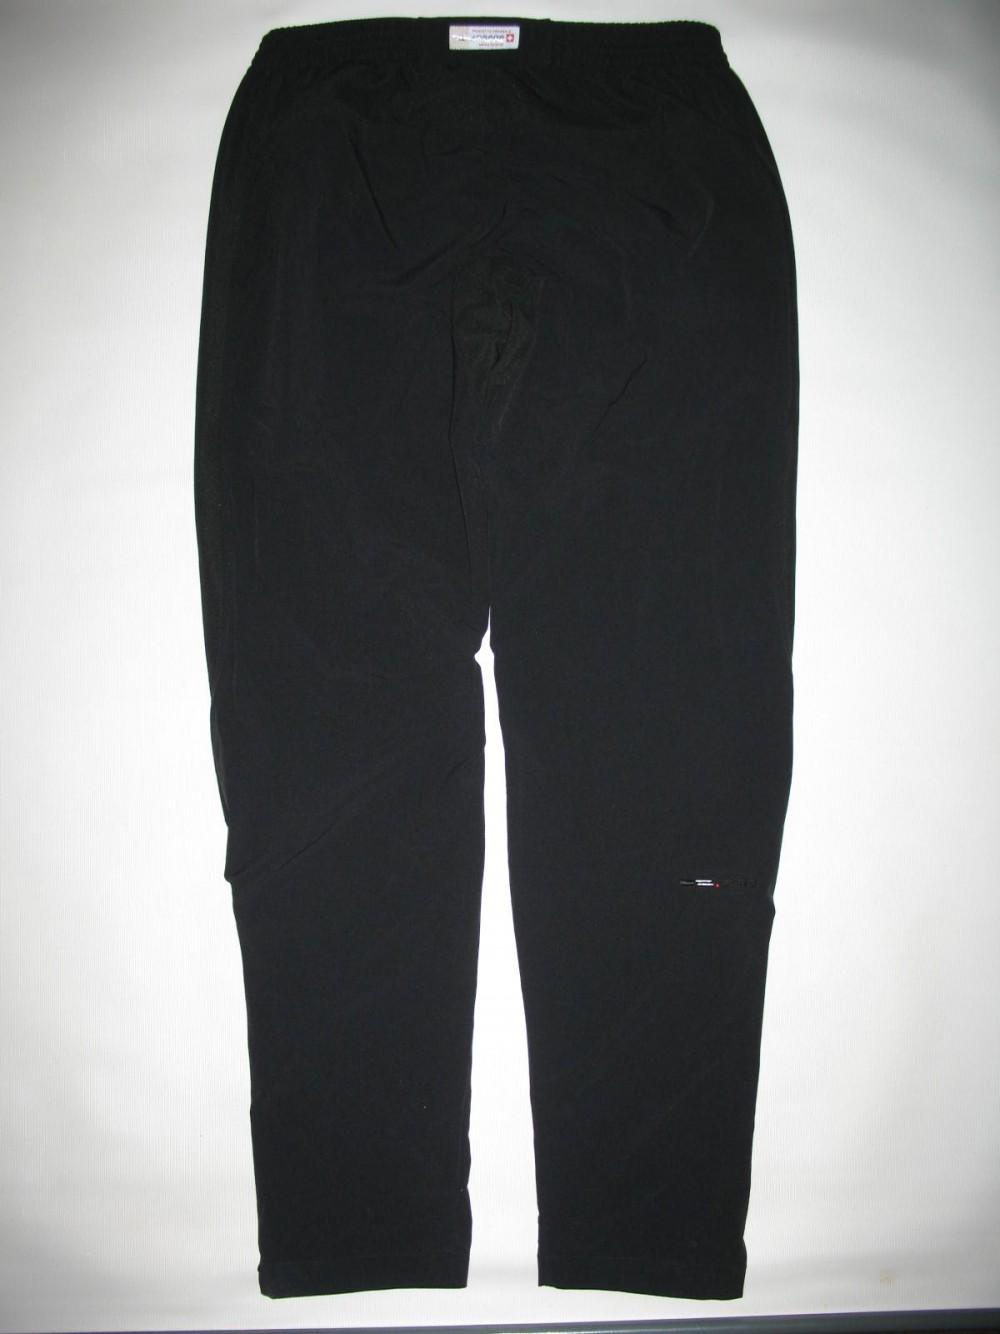 Велоштаны ASSOS db zero track cycling pants (размер XL) - 2